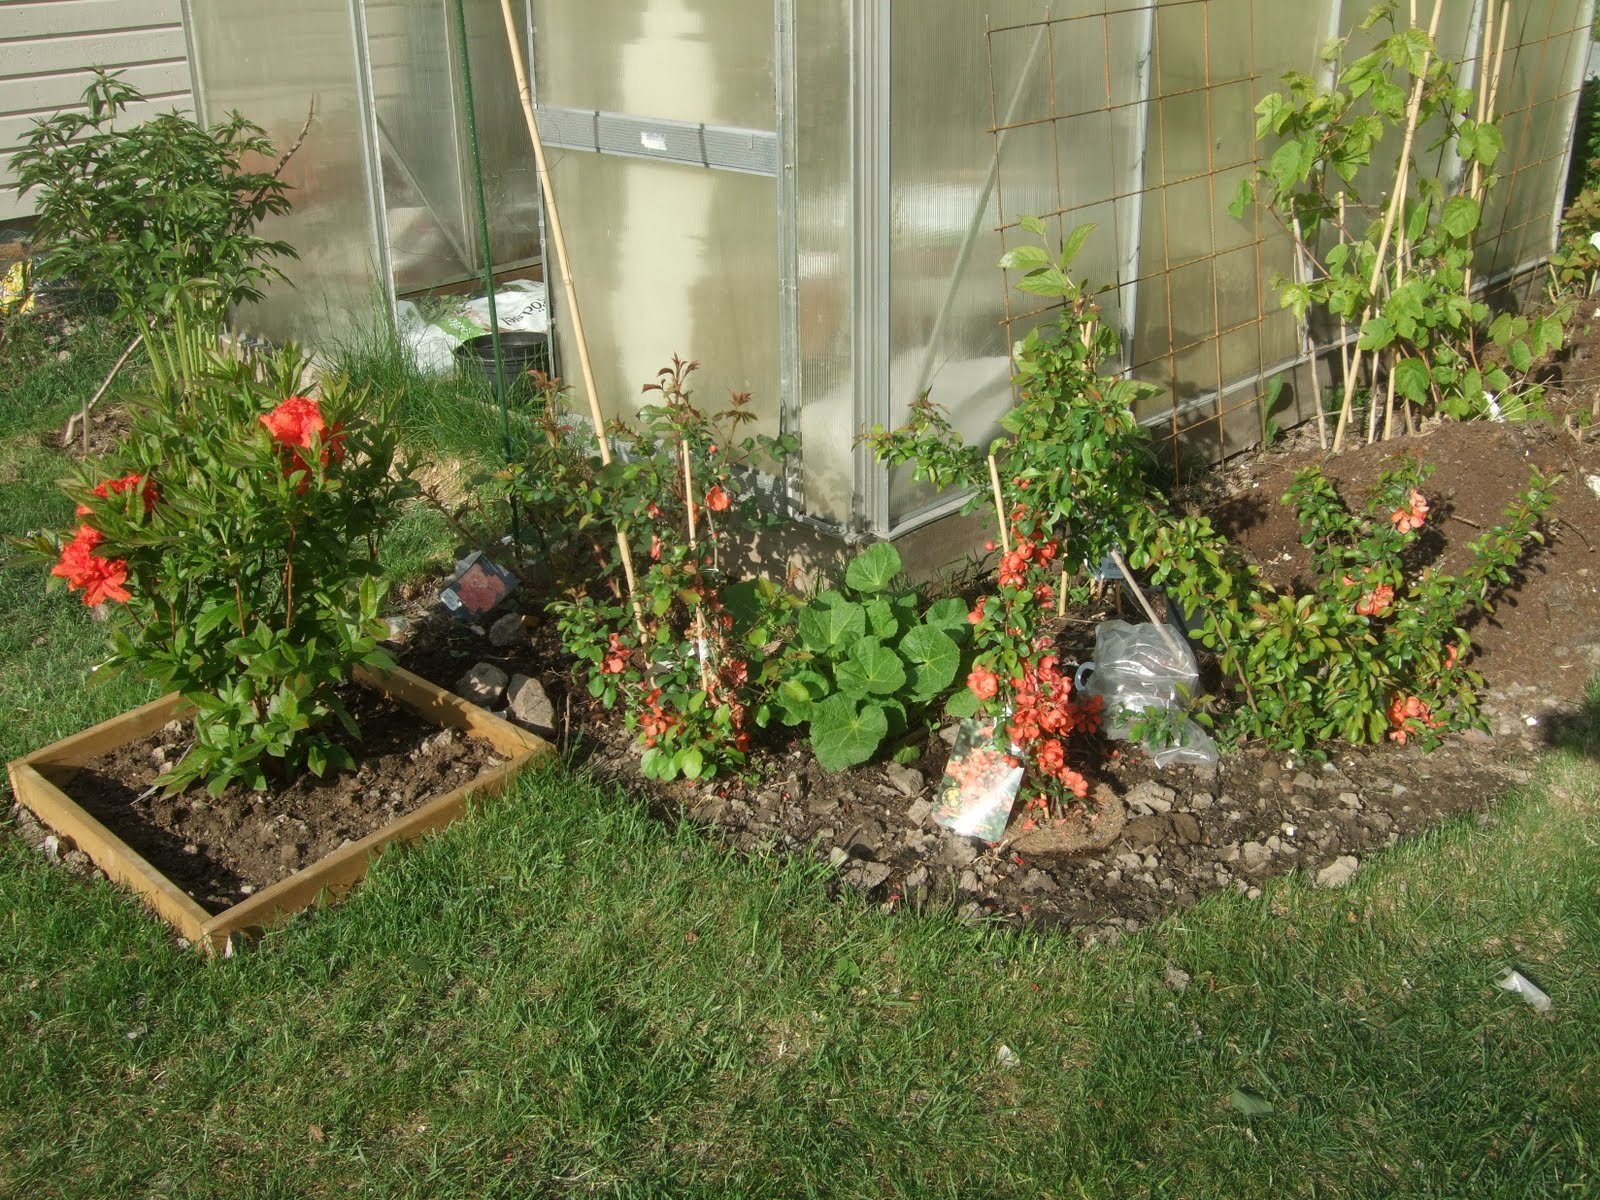 Mina trädgårdar: maj 2011